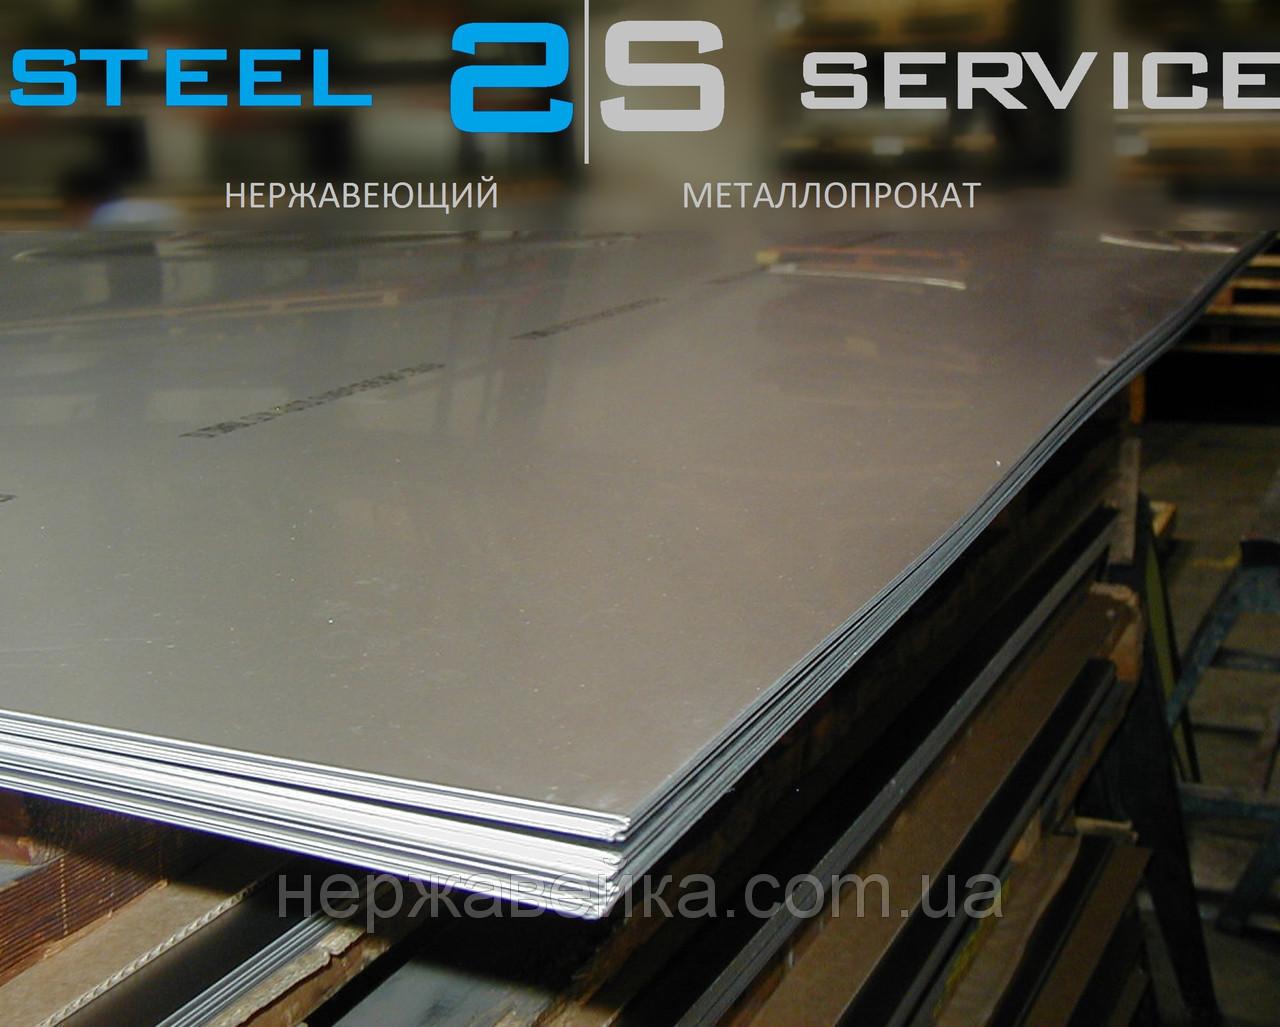 Листовая нержавейка 1х1250х2500мм  AISI 316Ti(10Х17Н13М2Т) 2B - матовый,  кислотостойкий